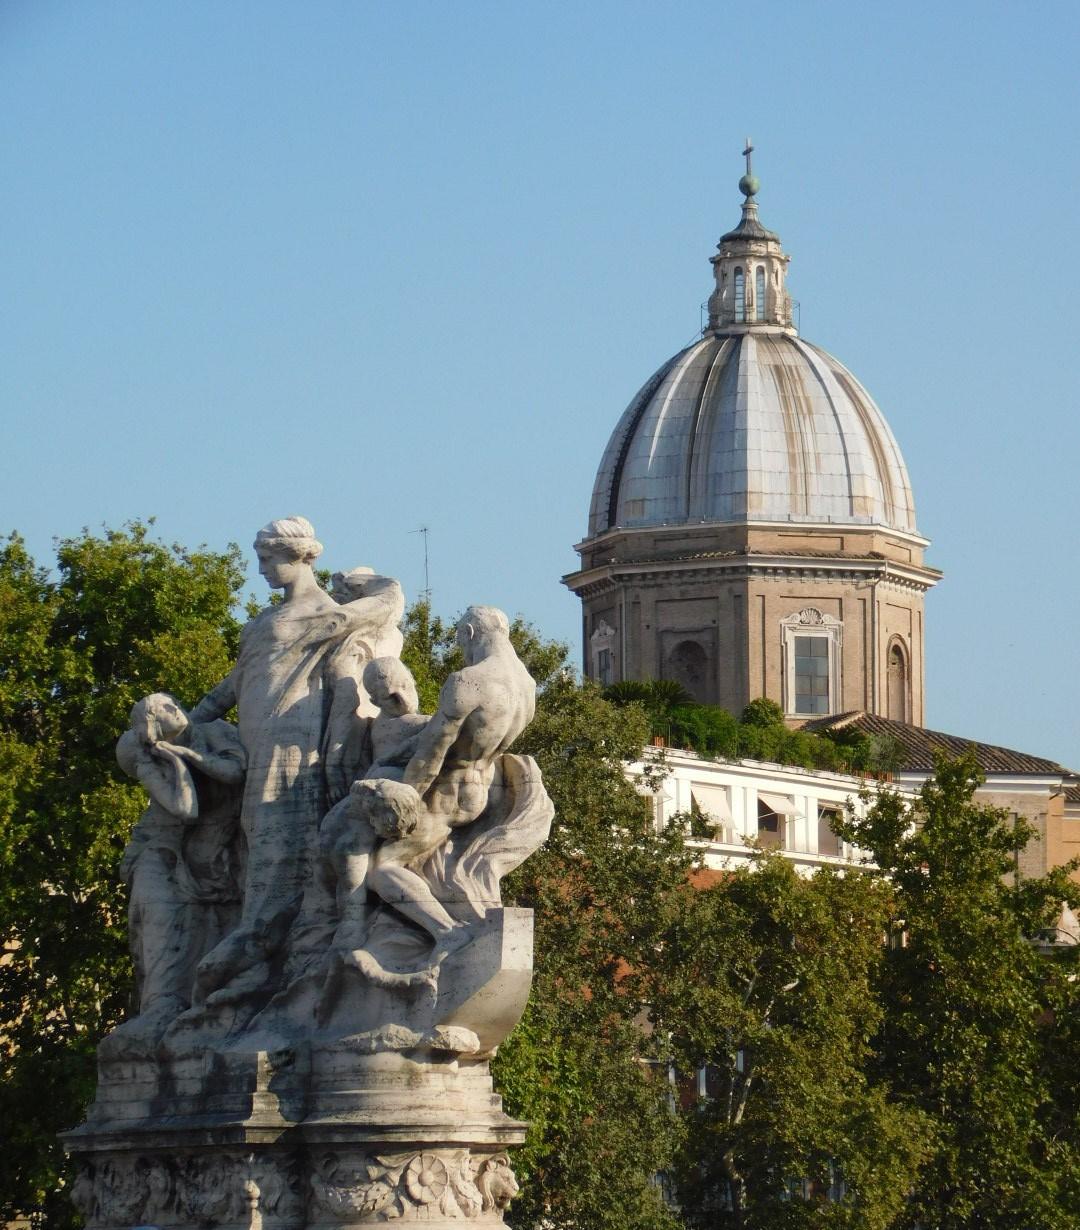 tiber-and-basilica rome